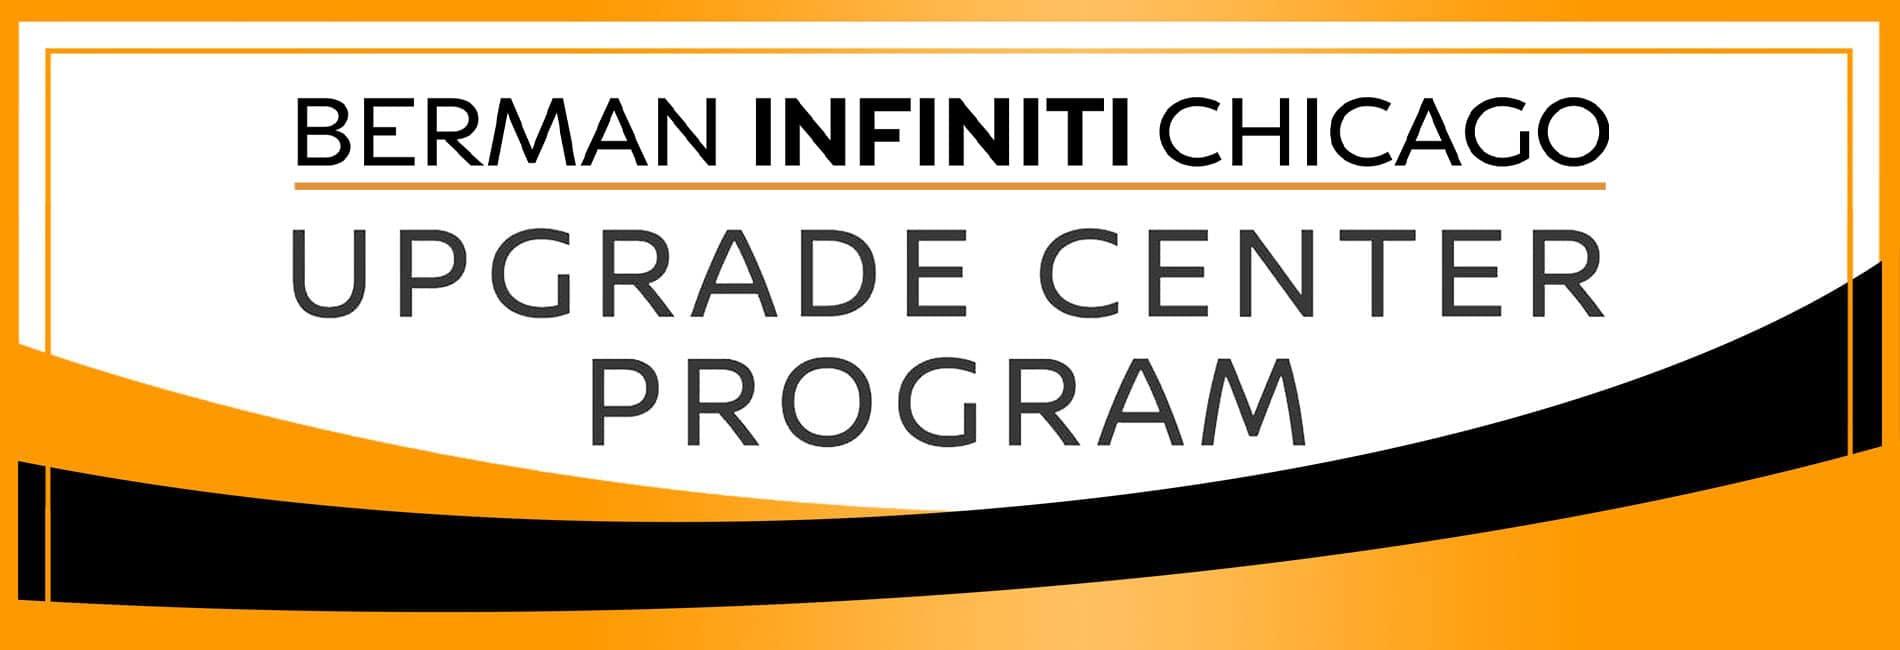 Upgrade Center at Berman INFINITI Chicago